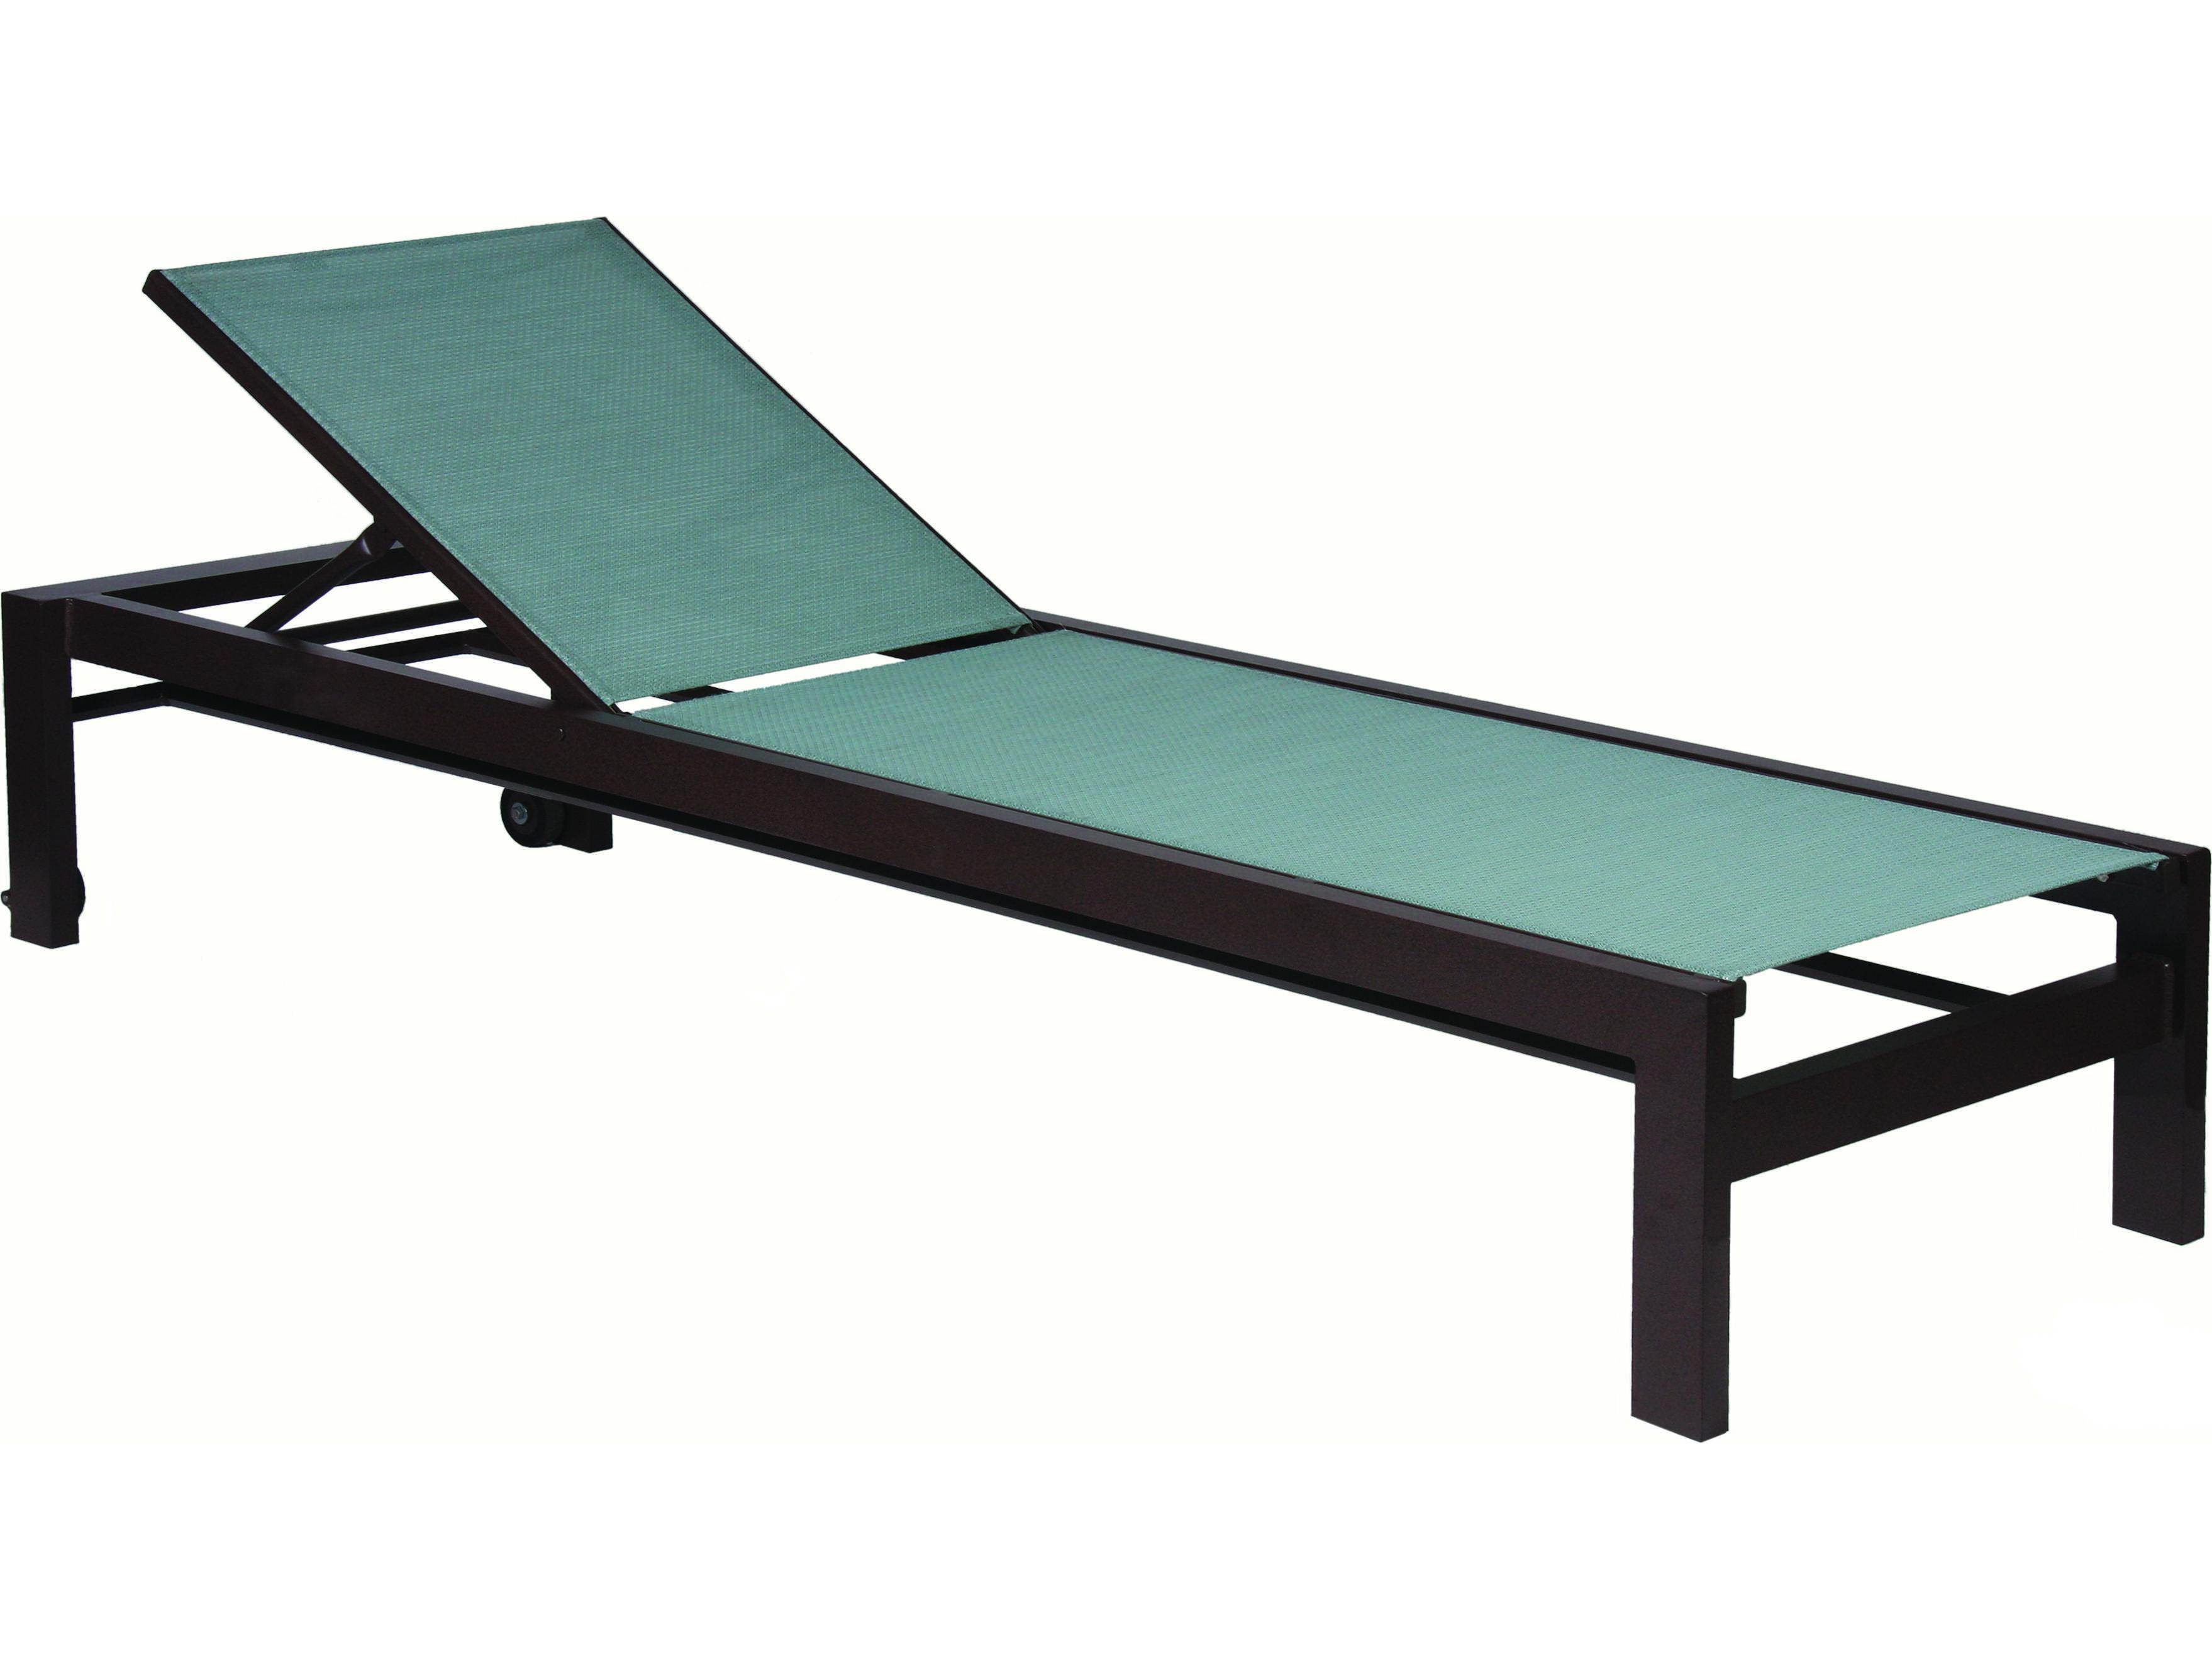 Suncoast vectra bold sling cast aluminum chaise lounge for Aluminum chaise lounge